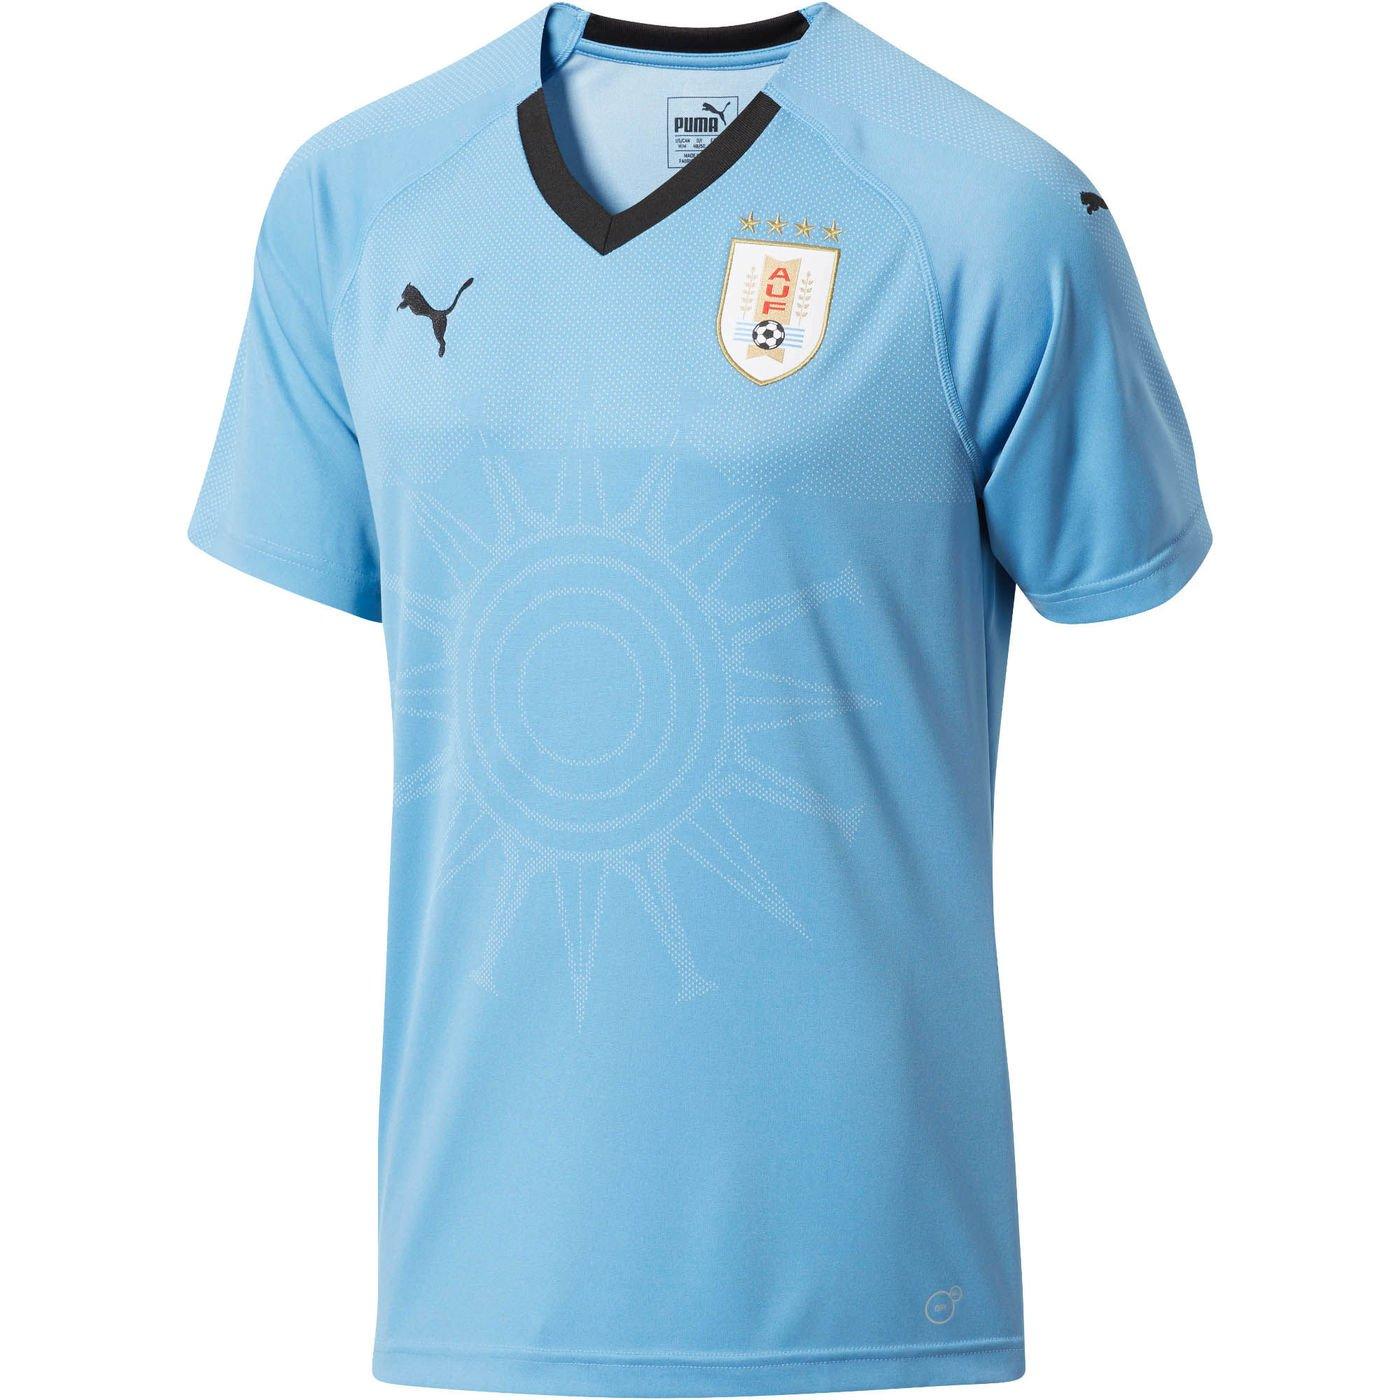 2018-2019 Uruguay Home Football Soccer T-Shirt Trikot (Diego Godin 3)